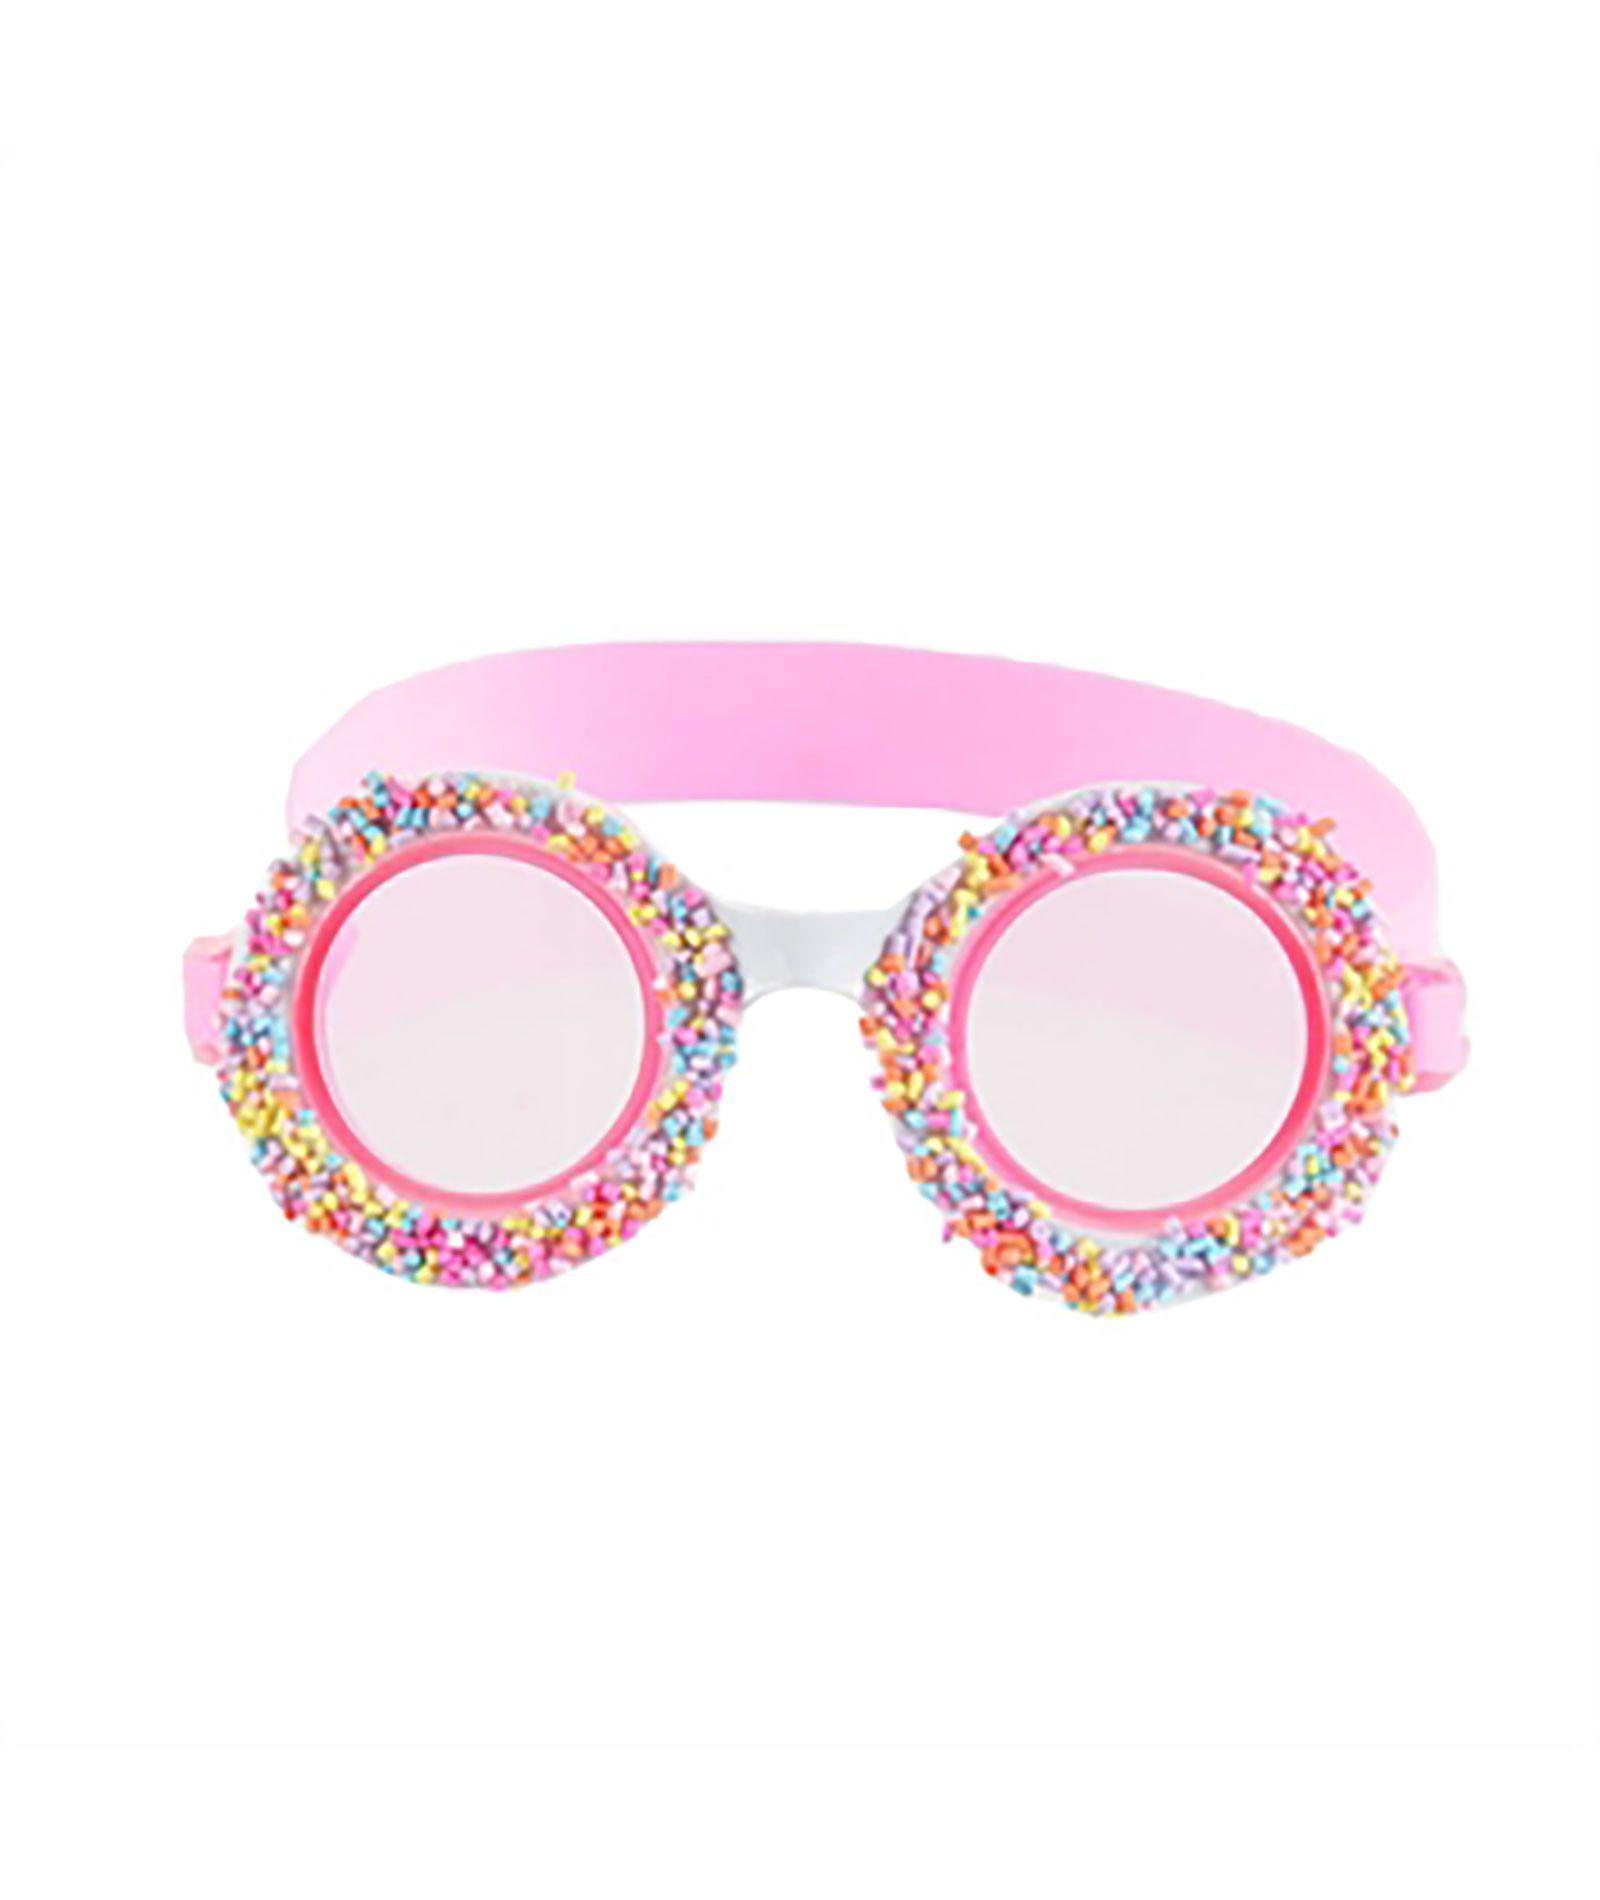 87faf677eda4 Bling2o Donut Swim Goggles